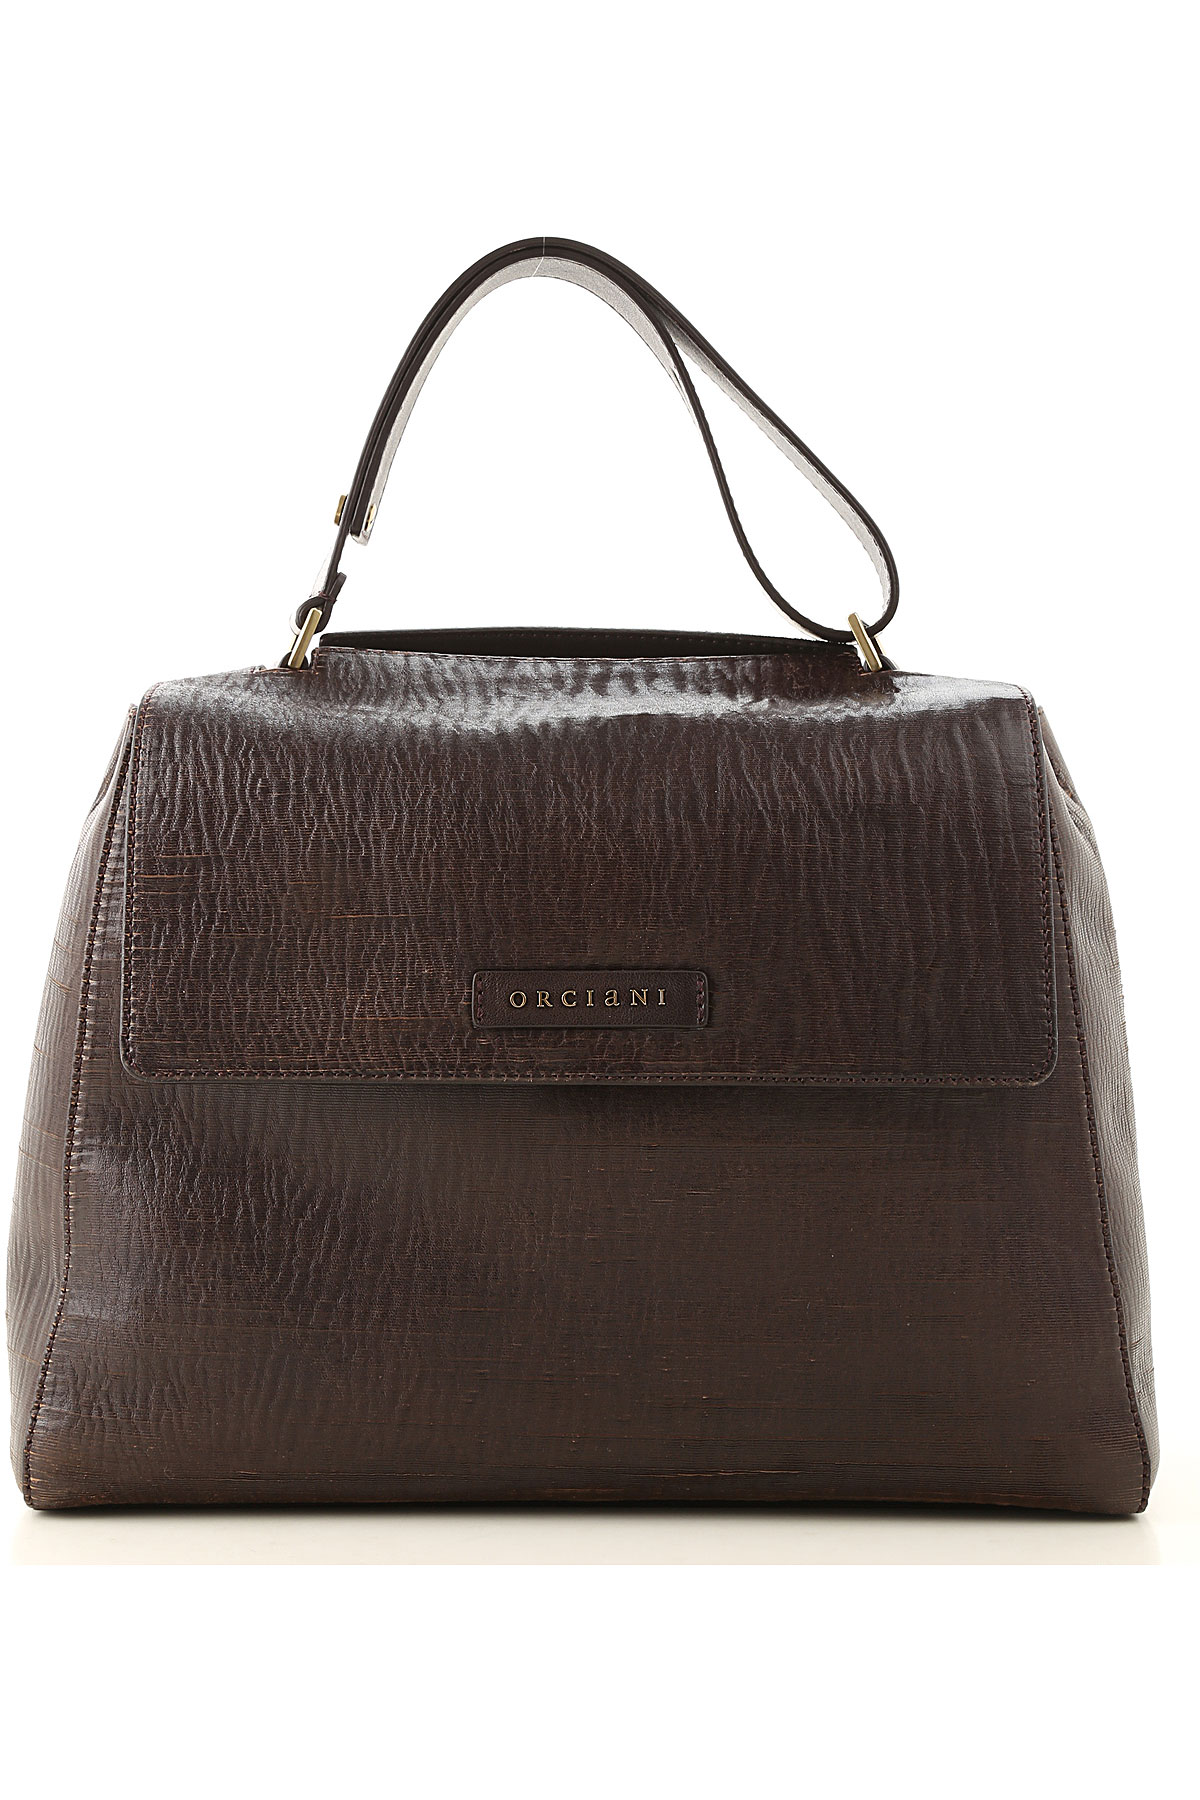 Orciani Top Handle Handbag On Sale, Dark Brown, Leather, 2019